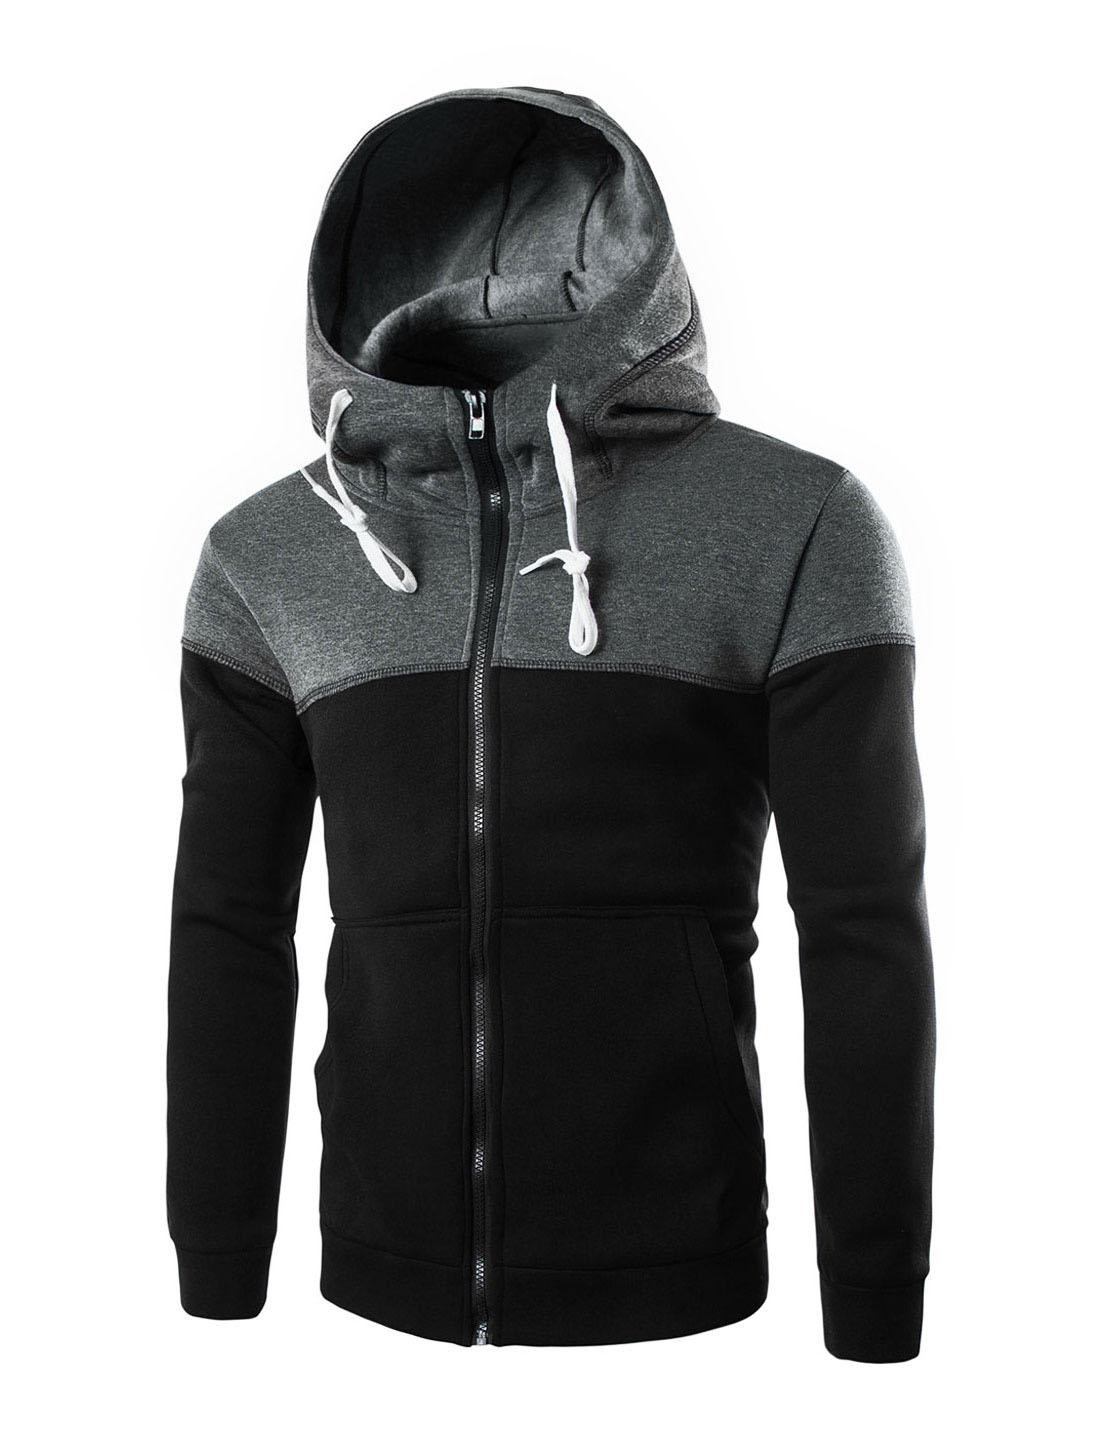 Men Color Block Kangaroo Pocket Zipper Hoodie Jacket Black S